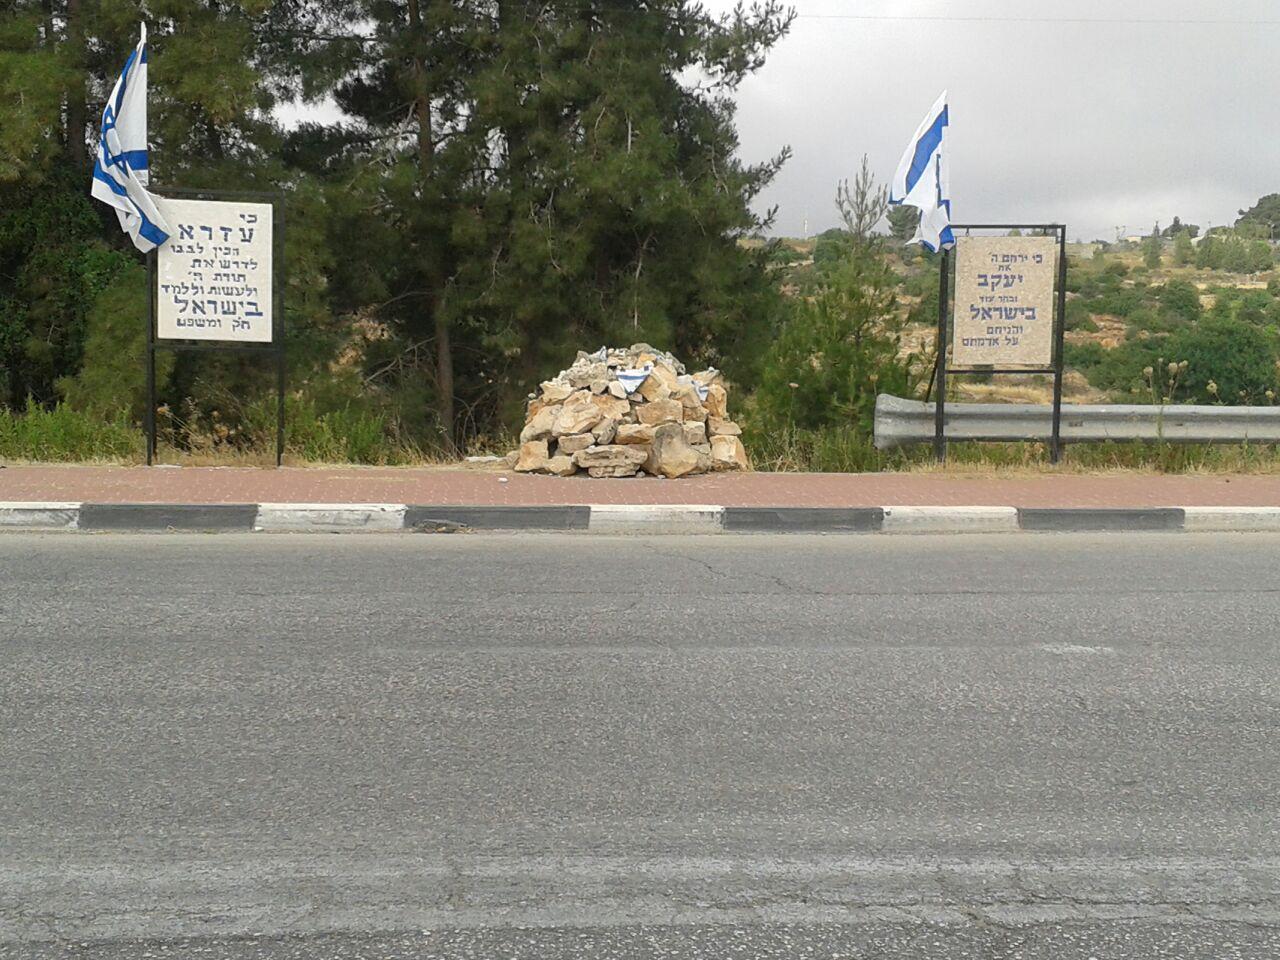 [Memorial to Ezra Schwartz and Yaakov Don at site of attack][Photo credit: Reva Burstein]